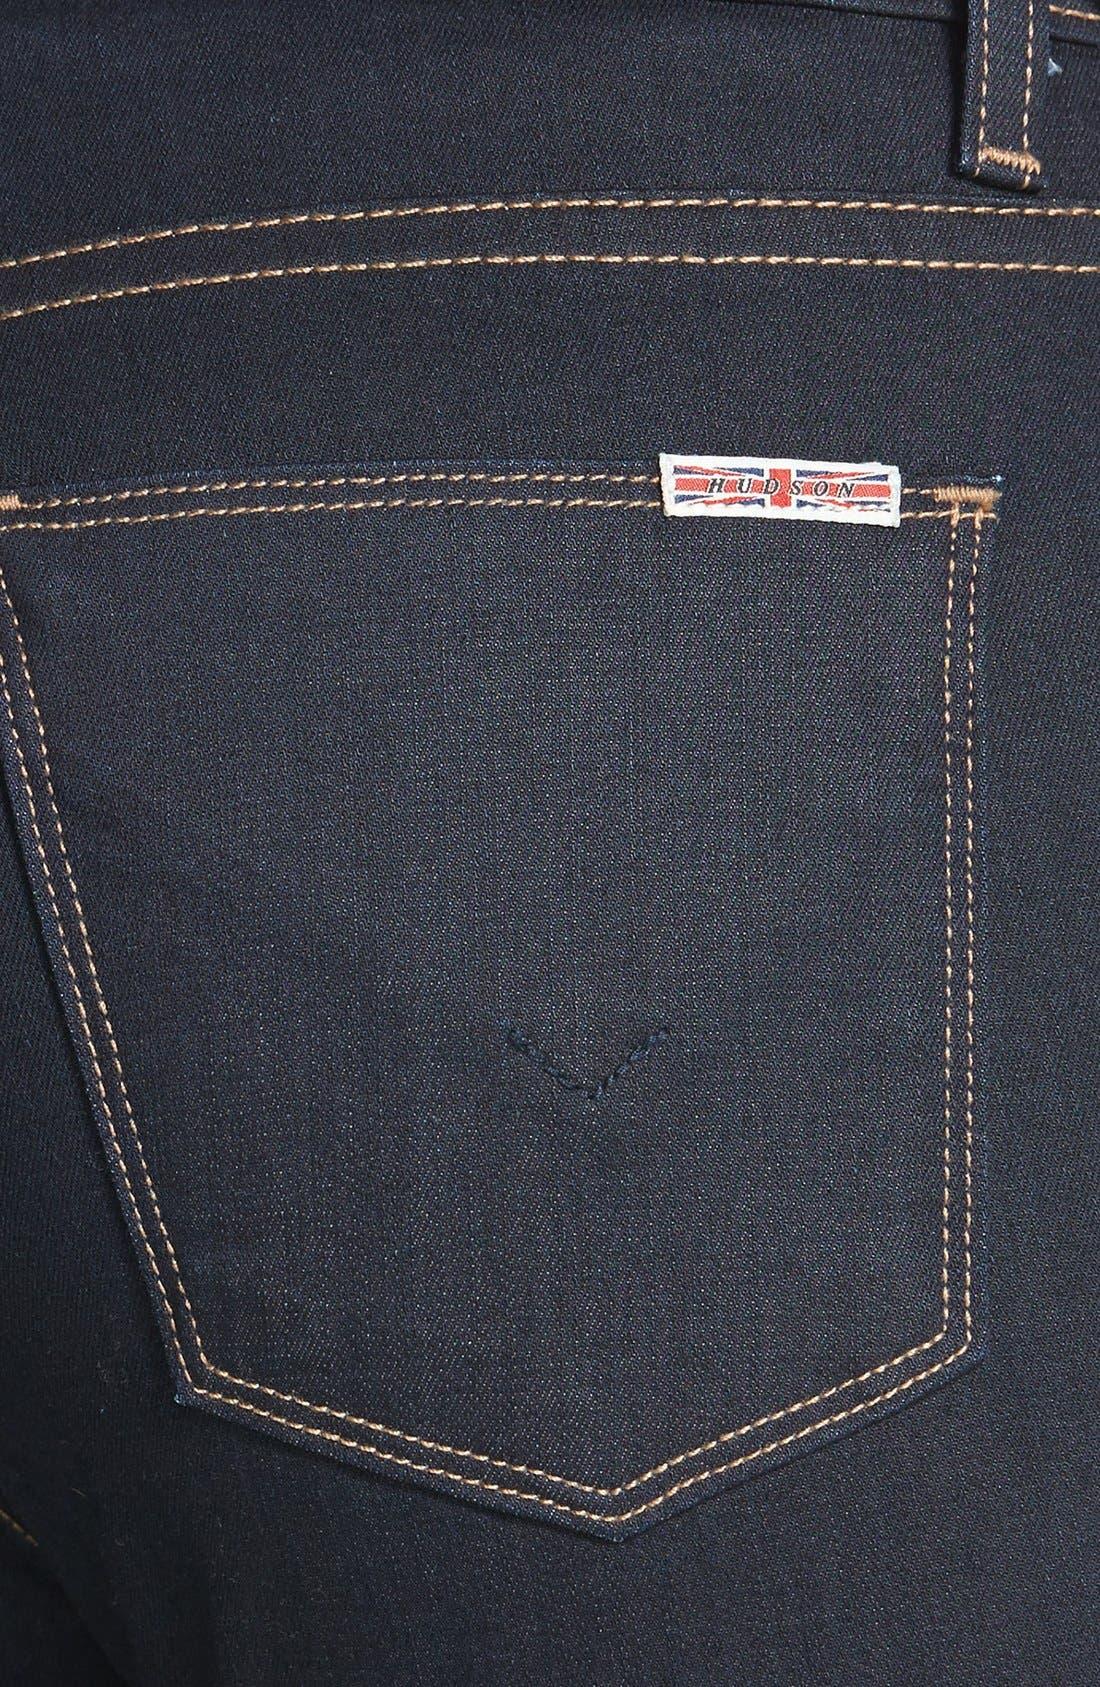 Alternate Image 3  - Hudson Jeans 'Barbara' High Rise Skinny Jeans (Storm)